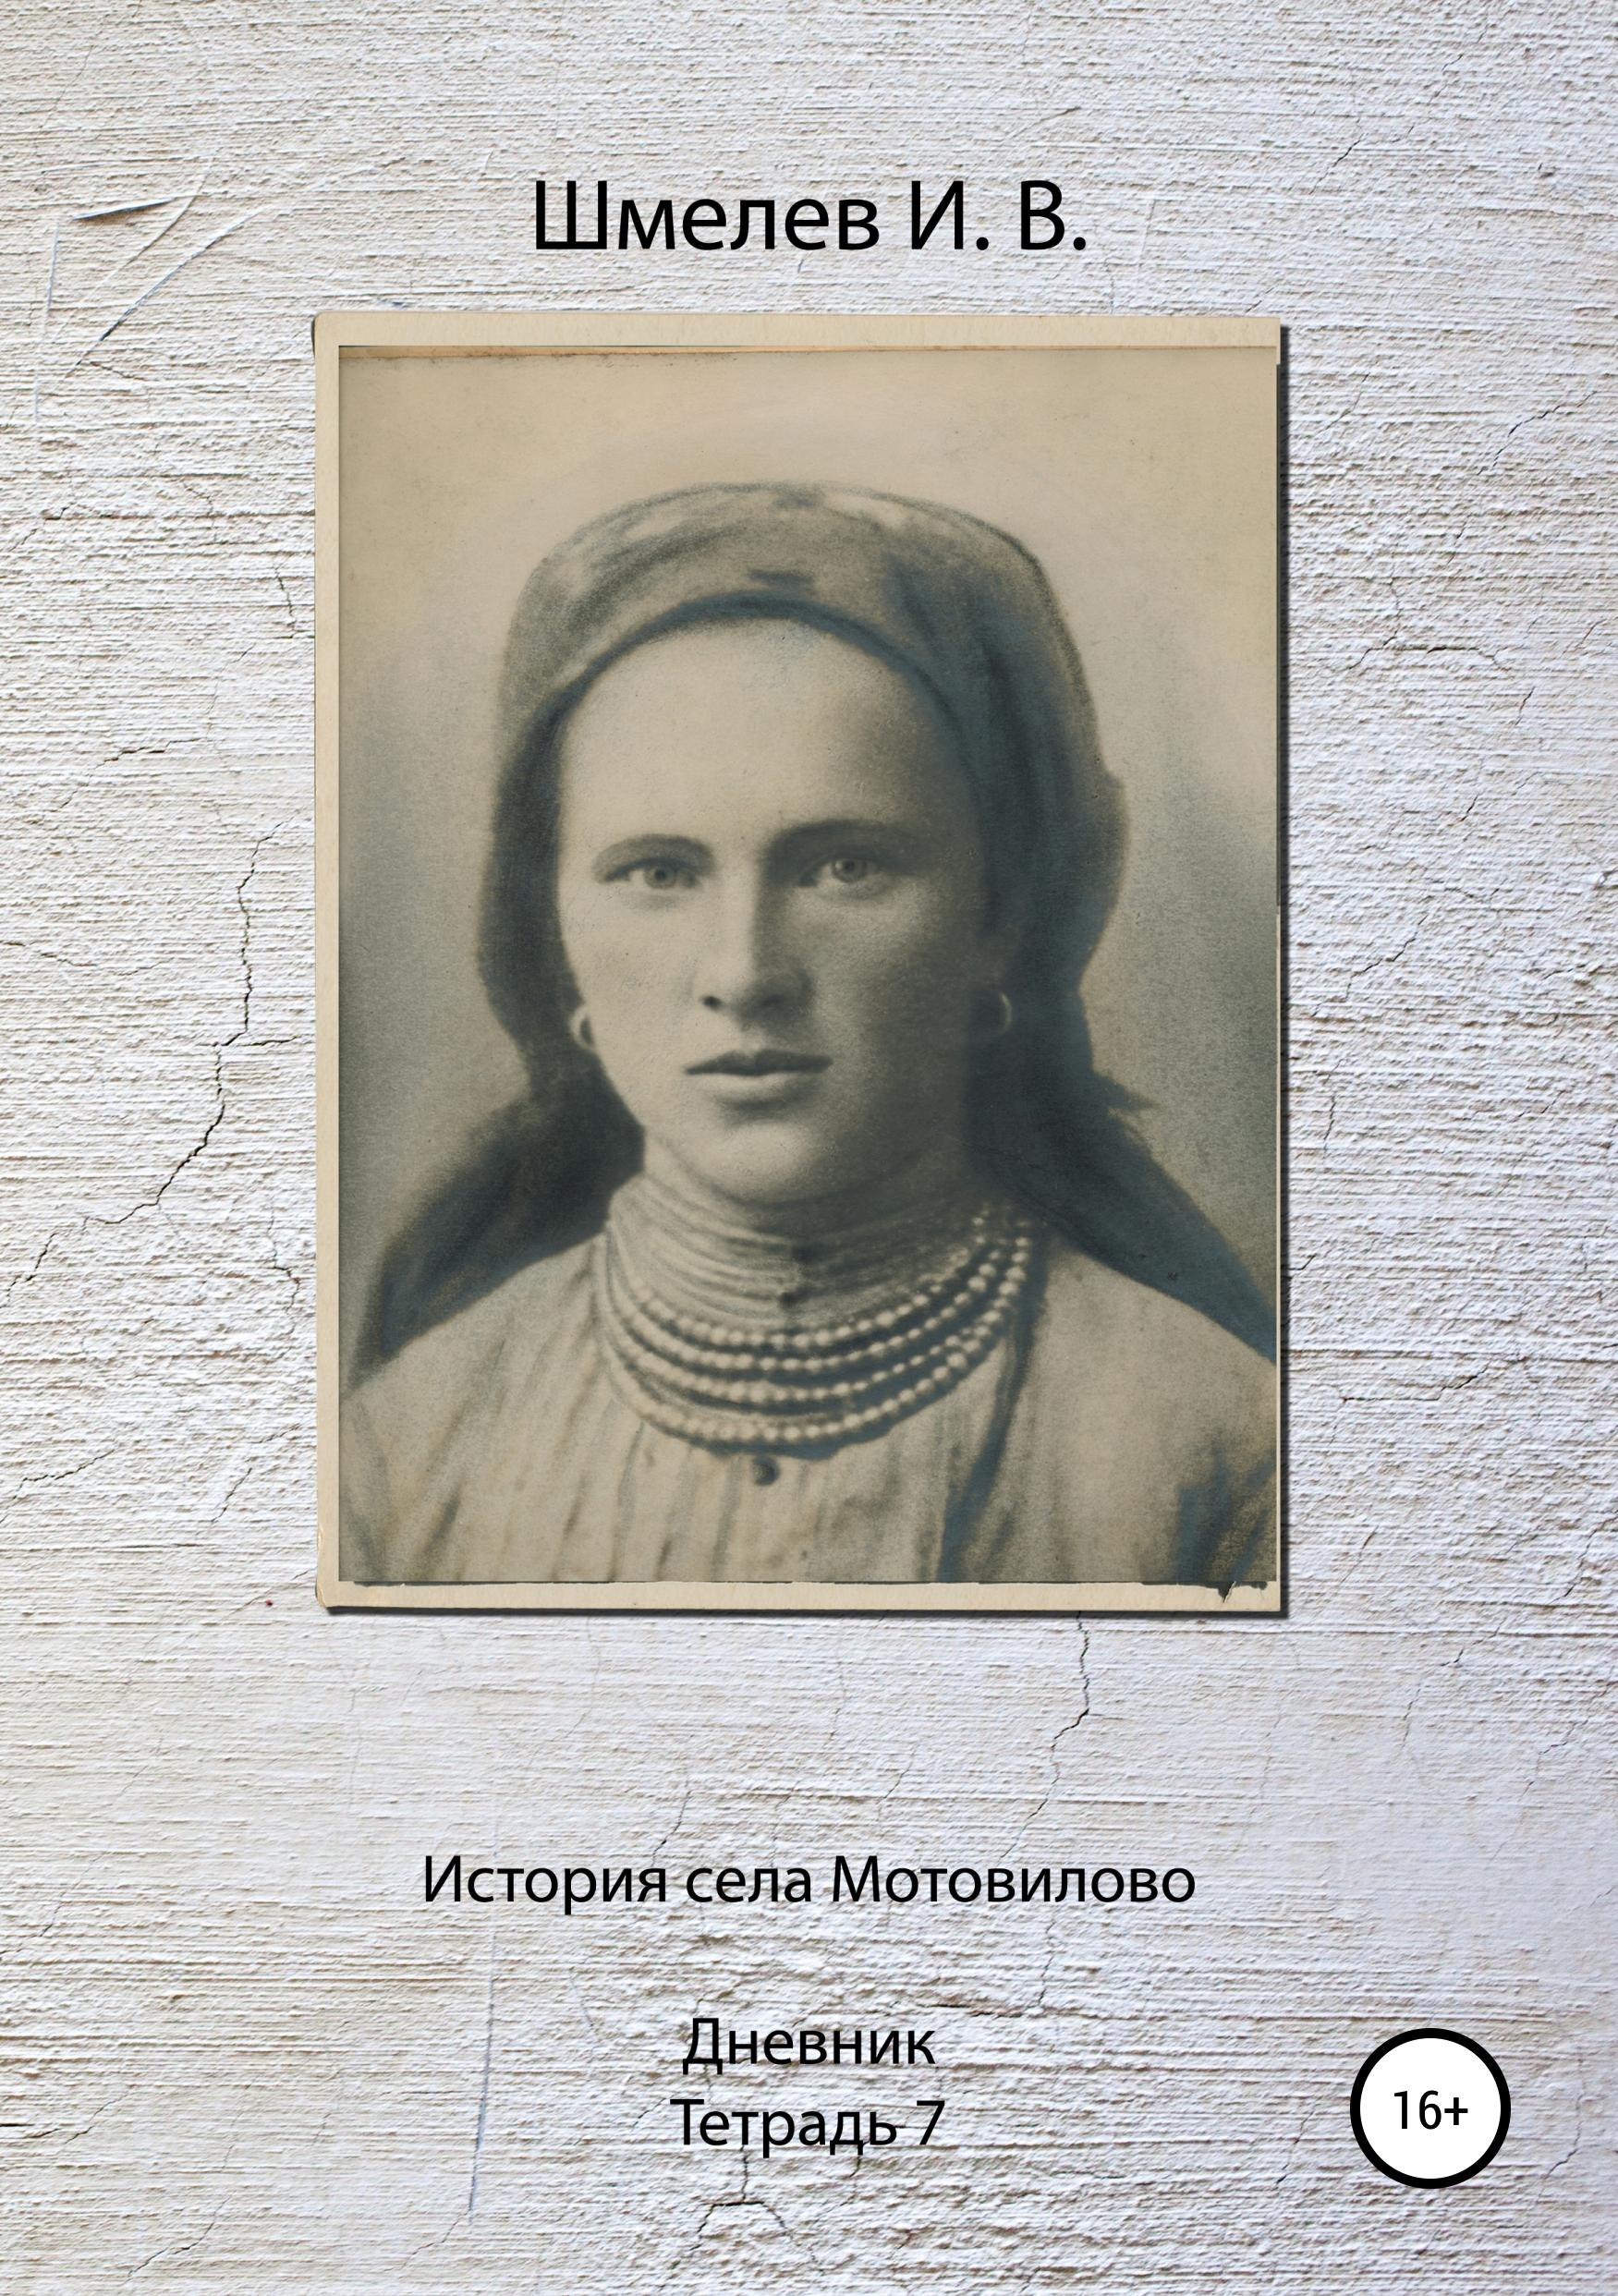 Иван Васильевич Шмелев История села Мотовилово. Тетрадь 7 (1925 г.) и с шмелев мой марс